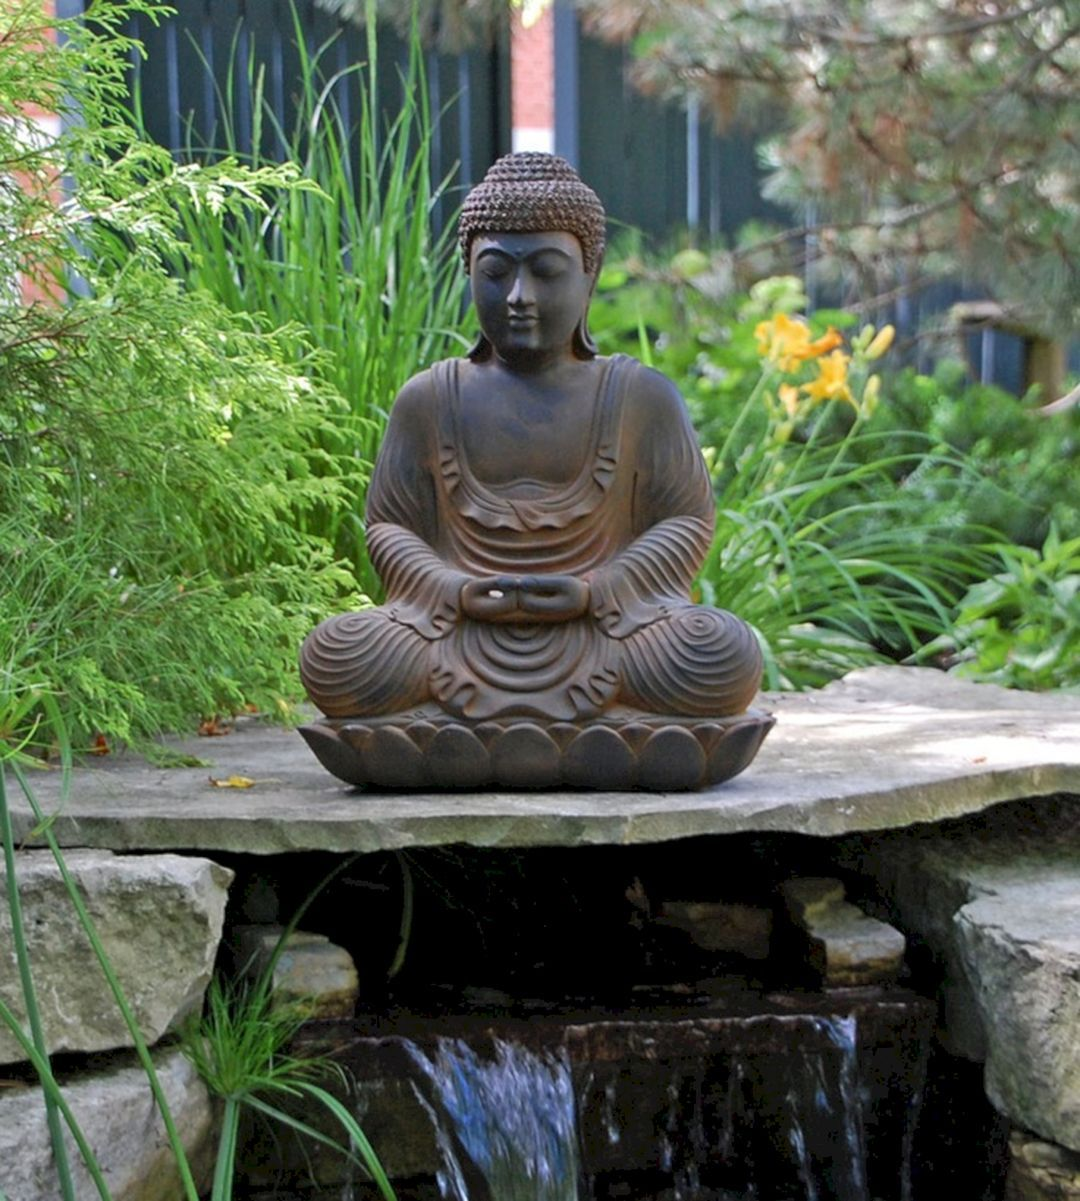 35 Awesome Buddha Garden Design Ideas For Calm Living Freshouz Com Buddha Garden Garden Statues Buddha